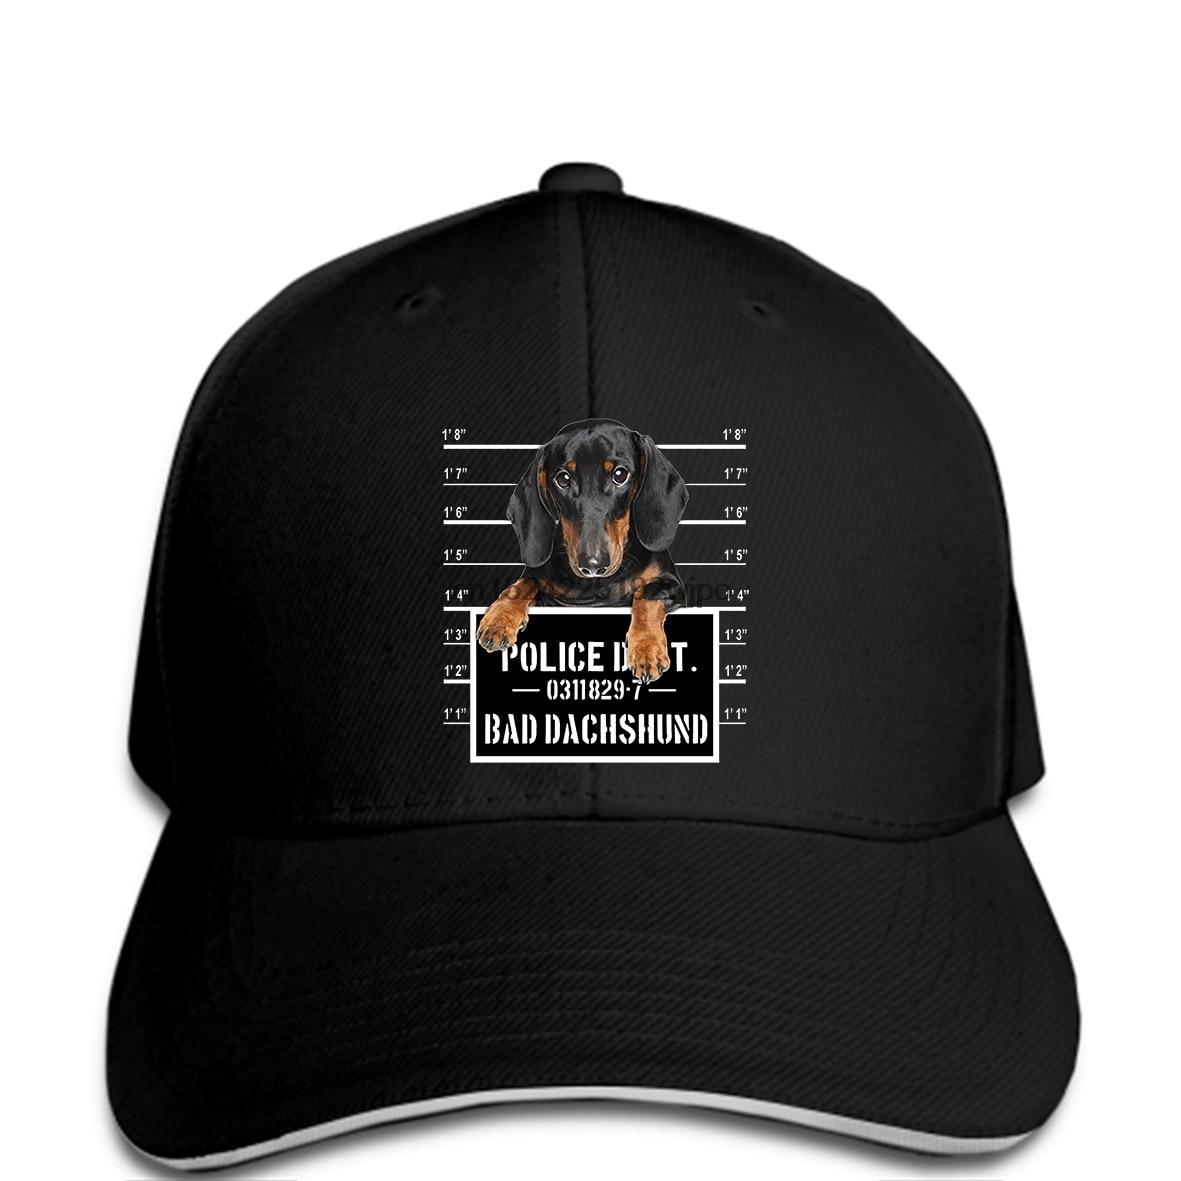 Divertido gorras de béisbol divertido Bad Dachshund negro Wiener Dog Jail taza Shot Mens cap